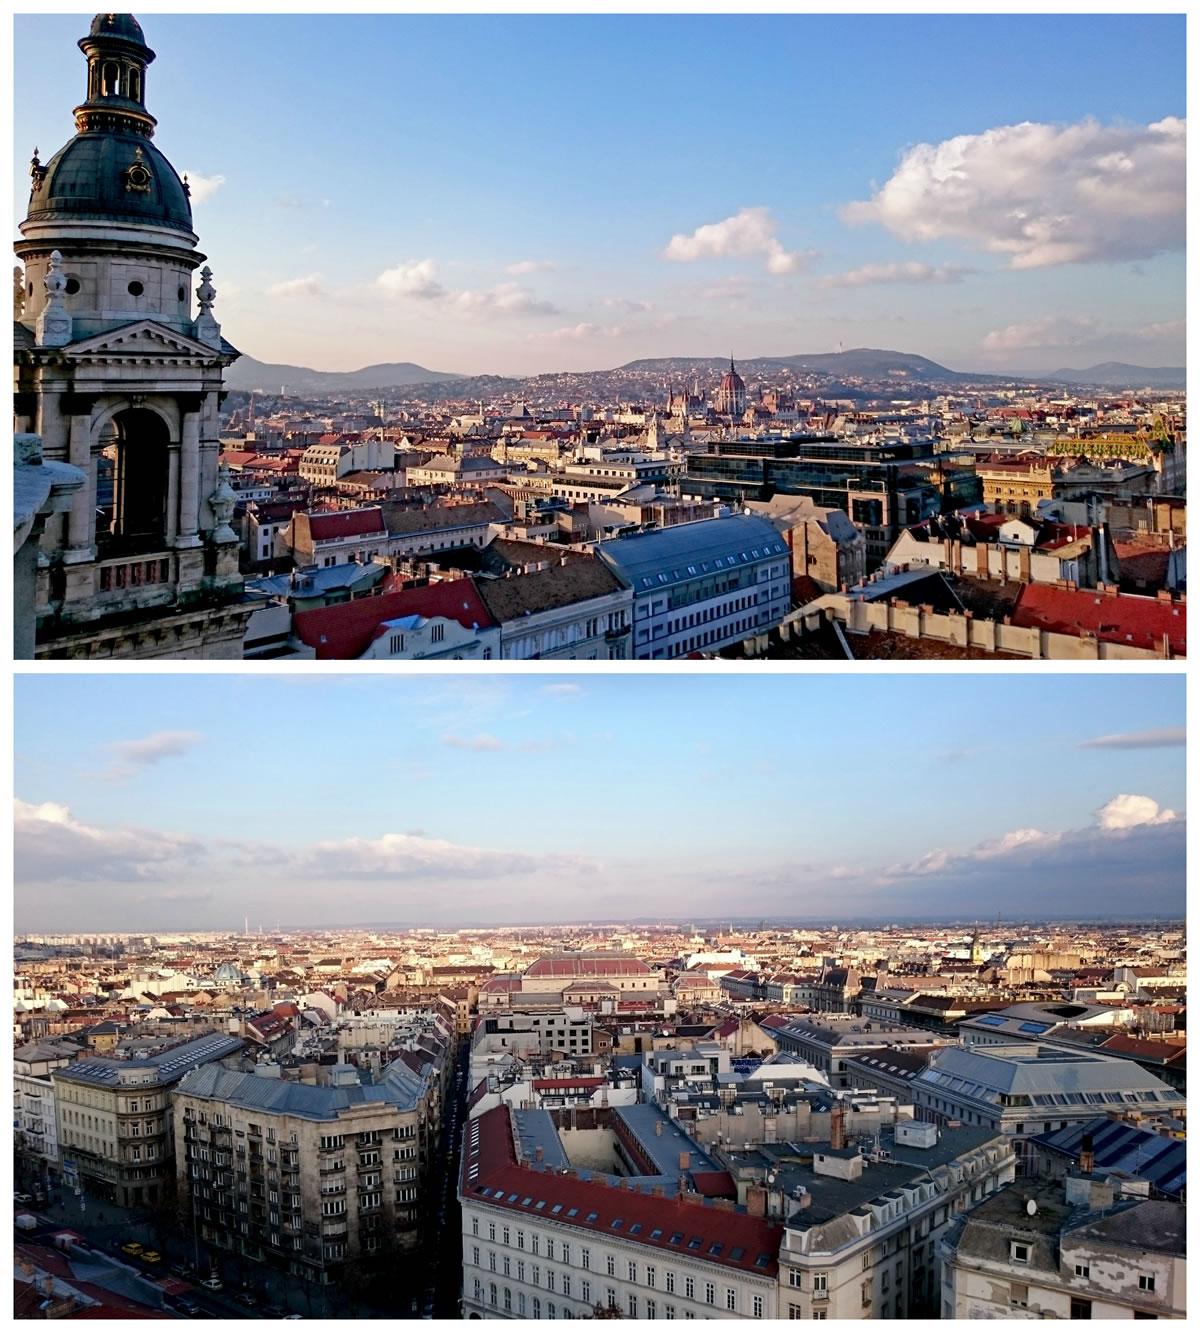 Pest-Panorama-Basilique-SaintEtienne-Budapest